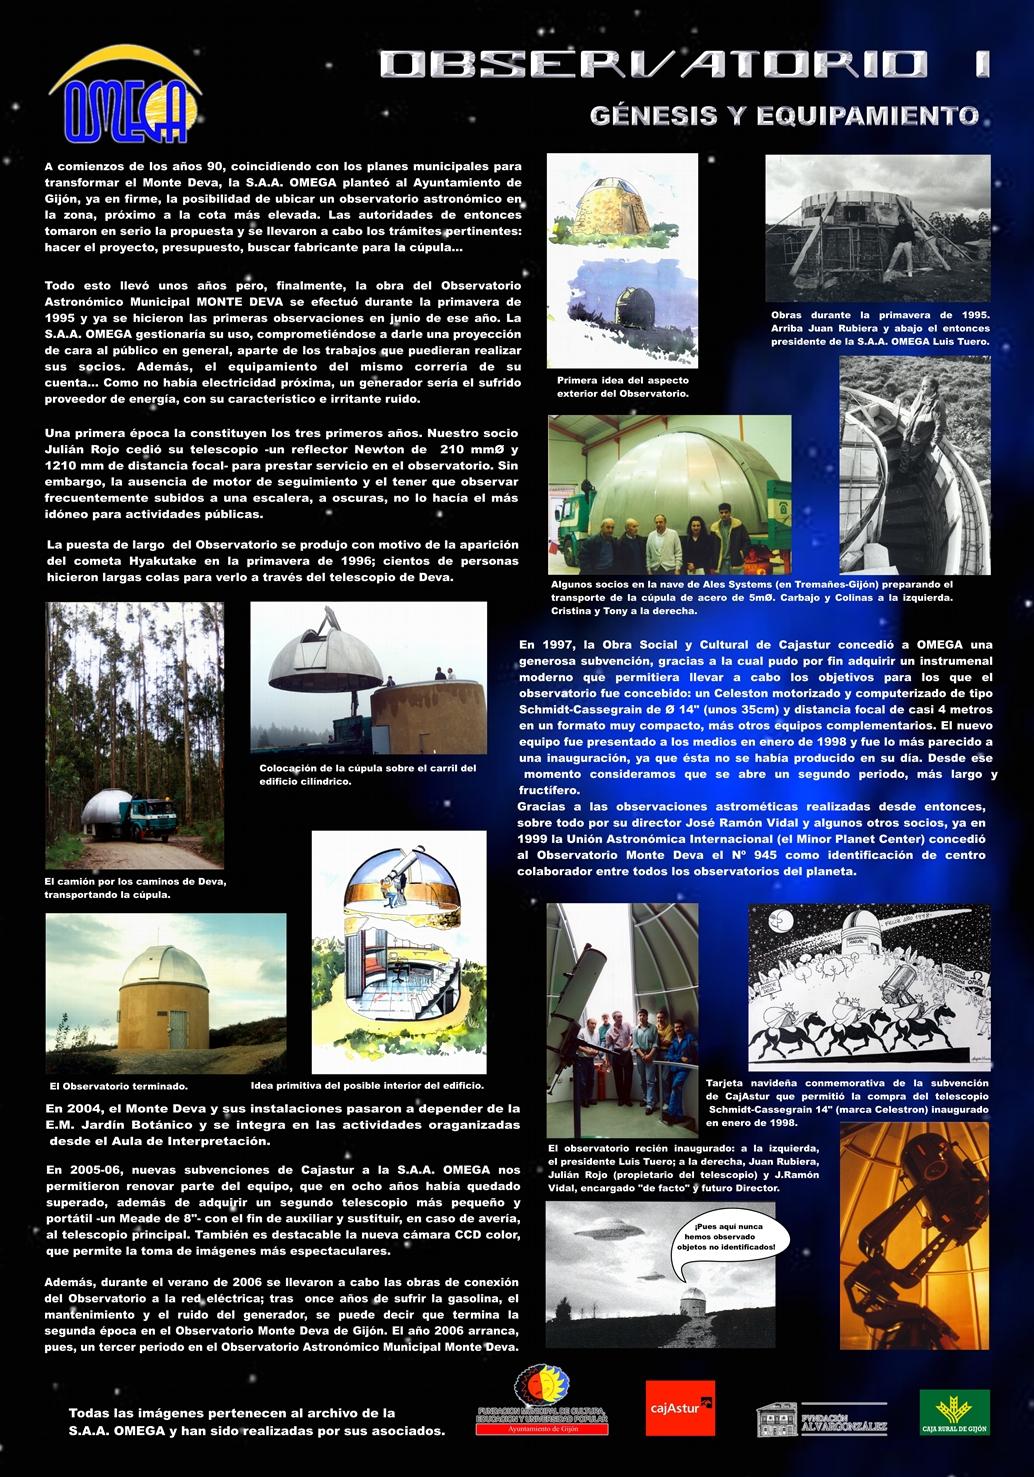 17-observatorio-I-1034x1477.jpg